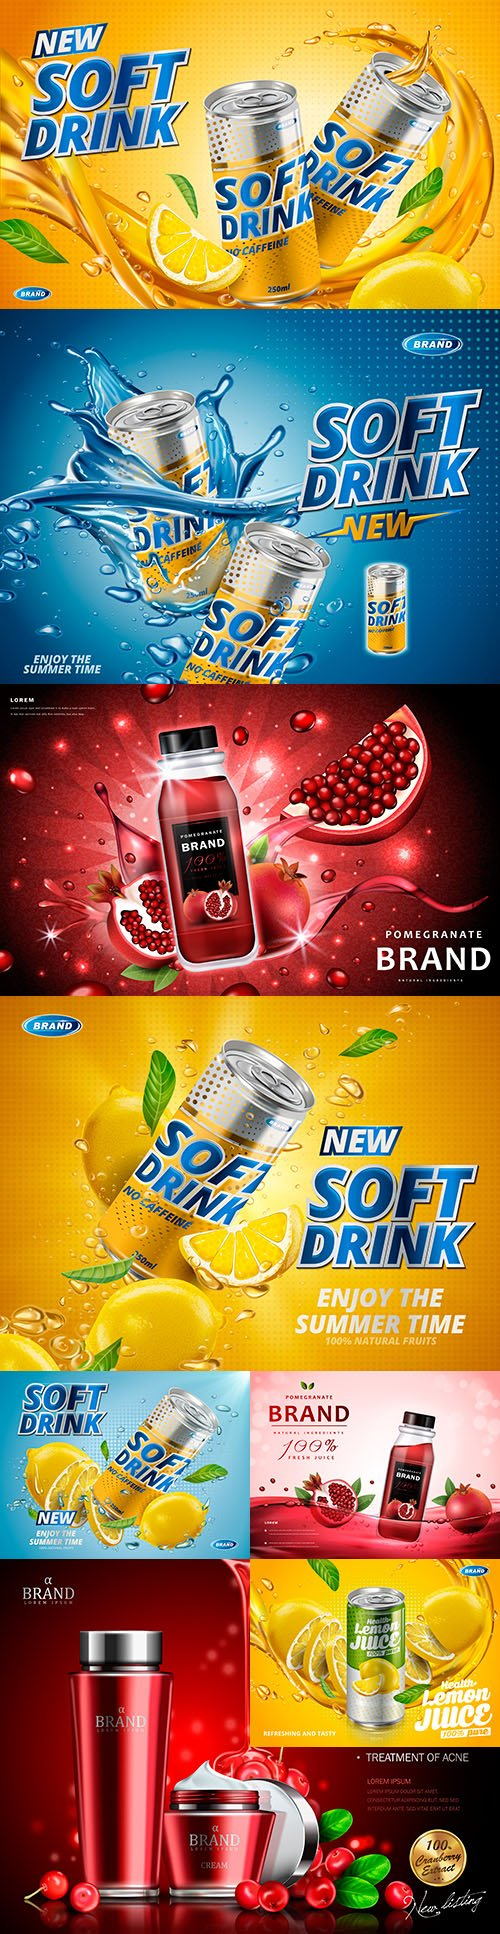 Lemon-flavored soft drink and pomegranate juice design advertising